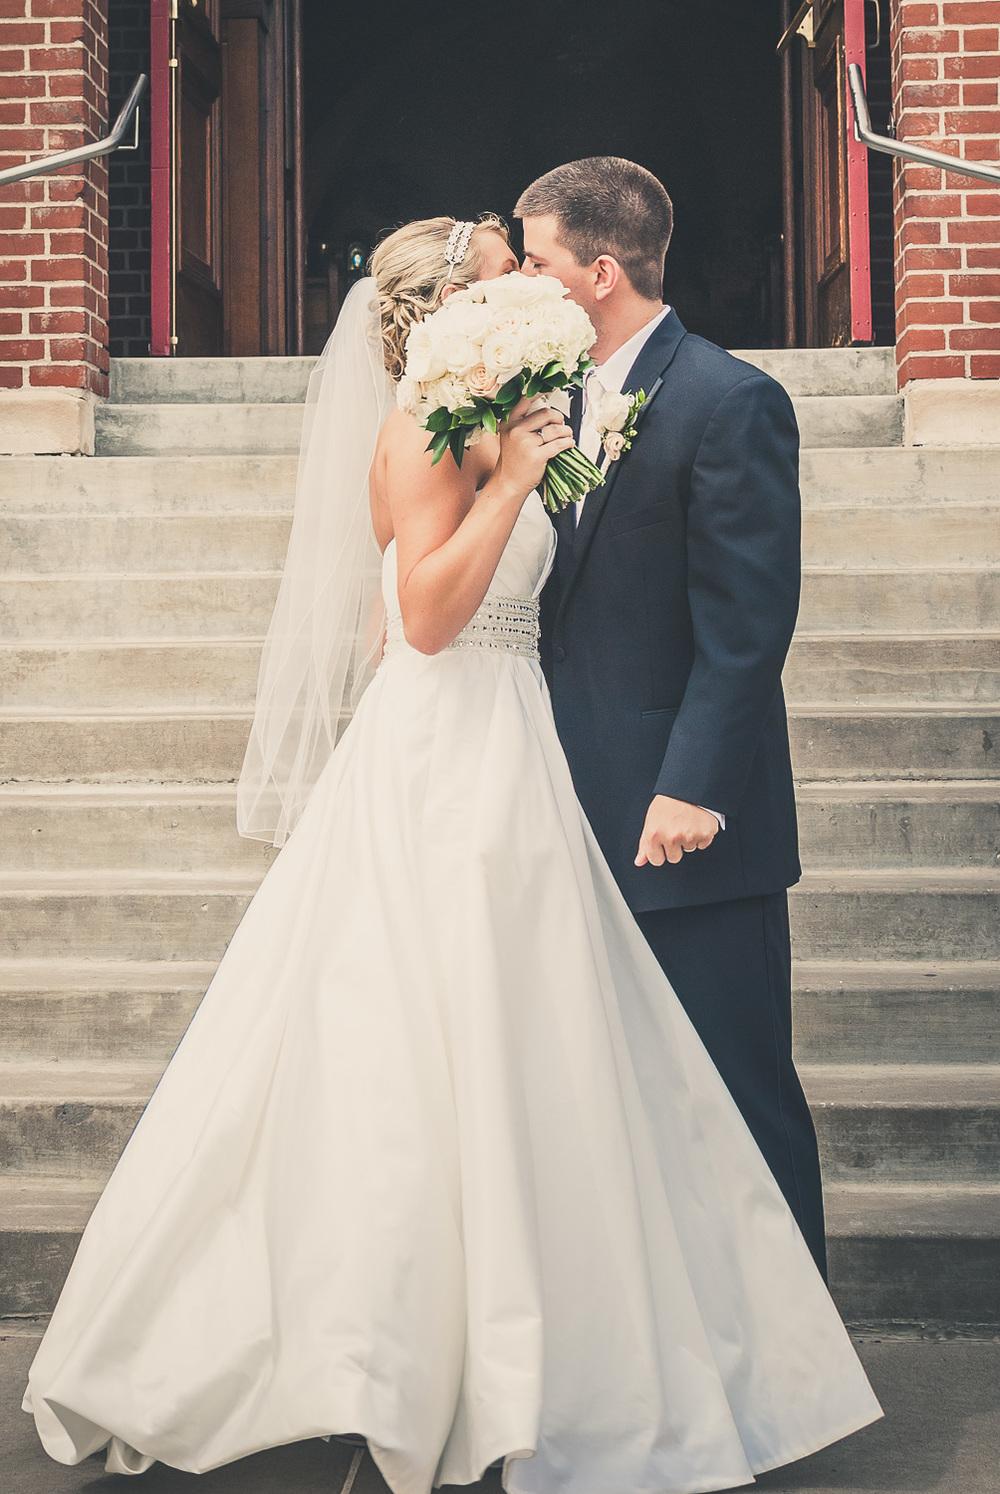 Biddle-Stangler Wedding - 20120811 - 295.jpg